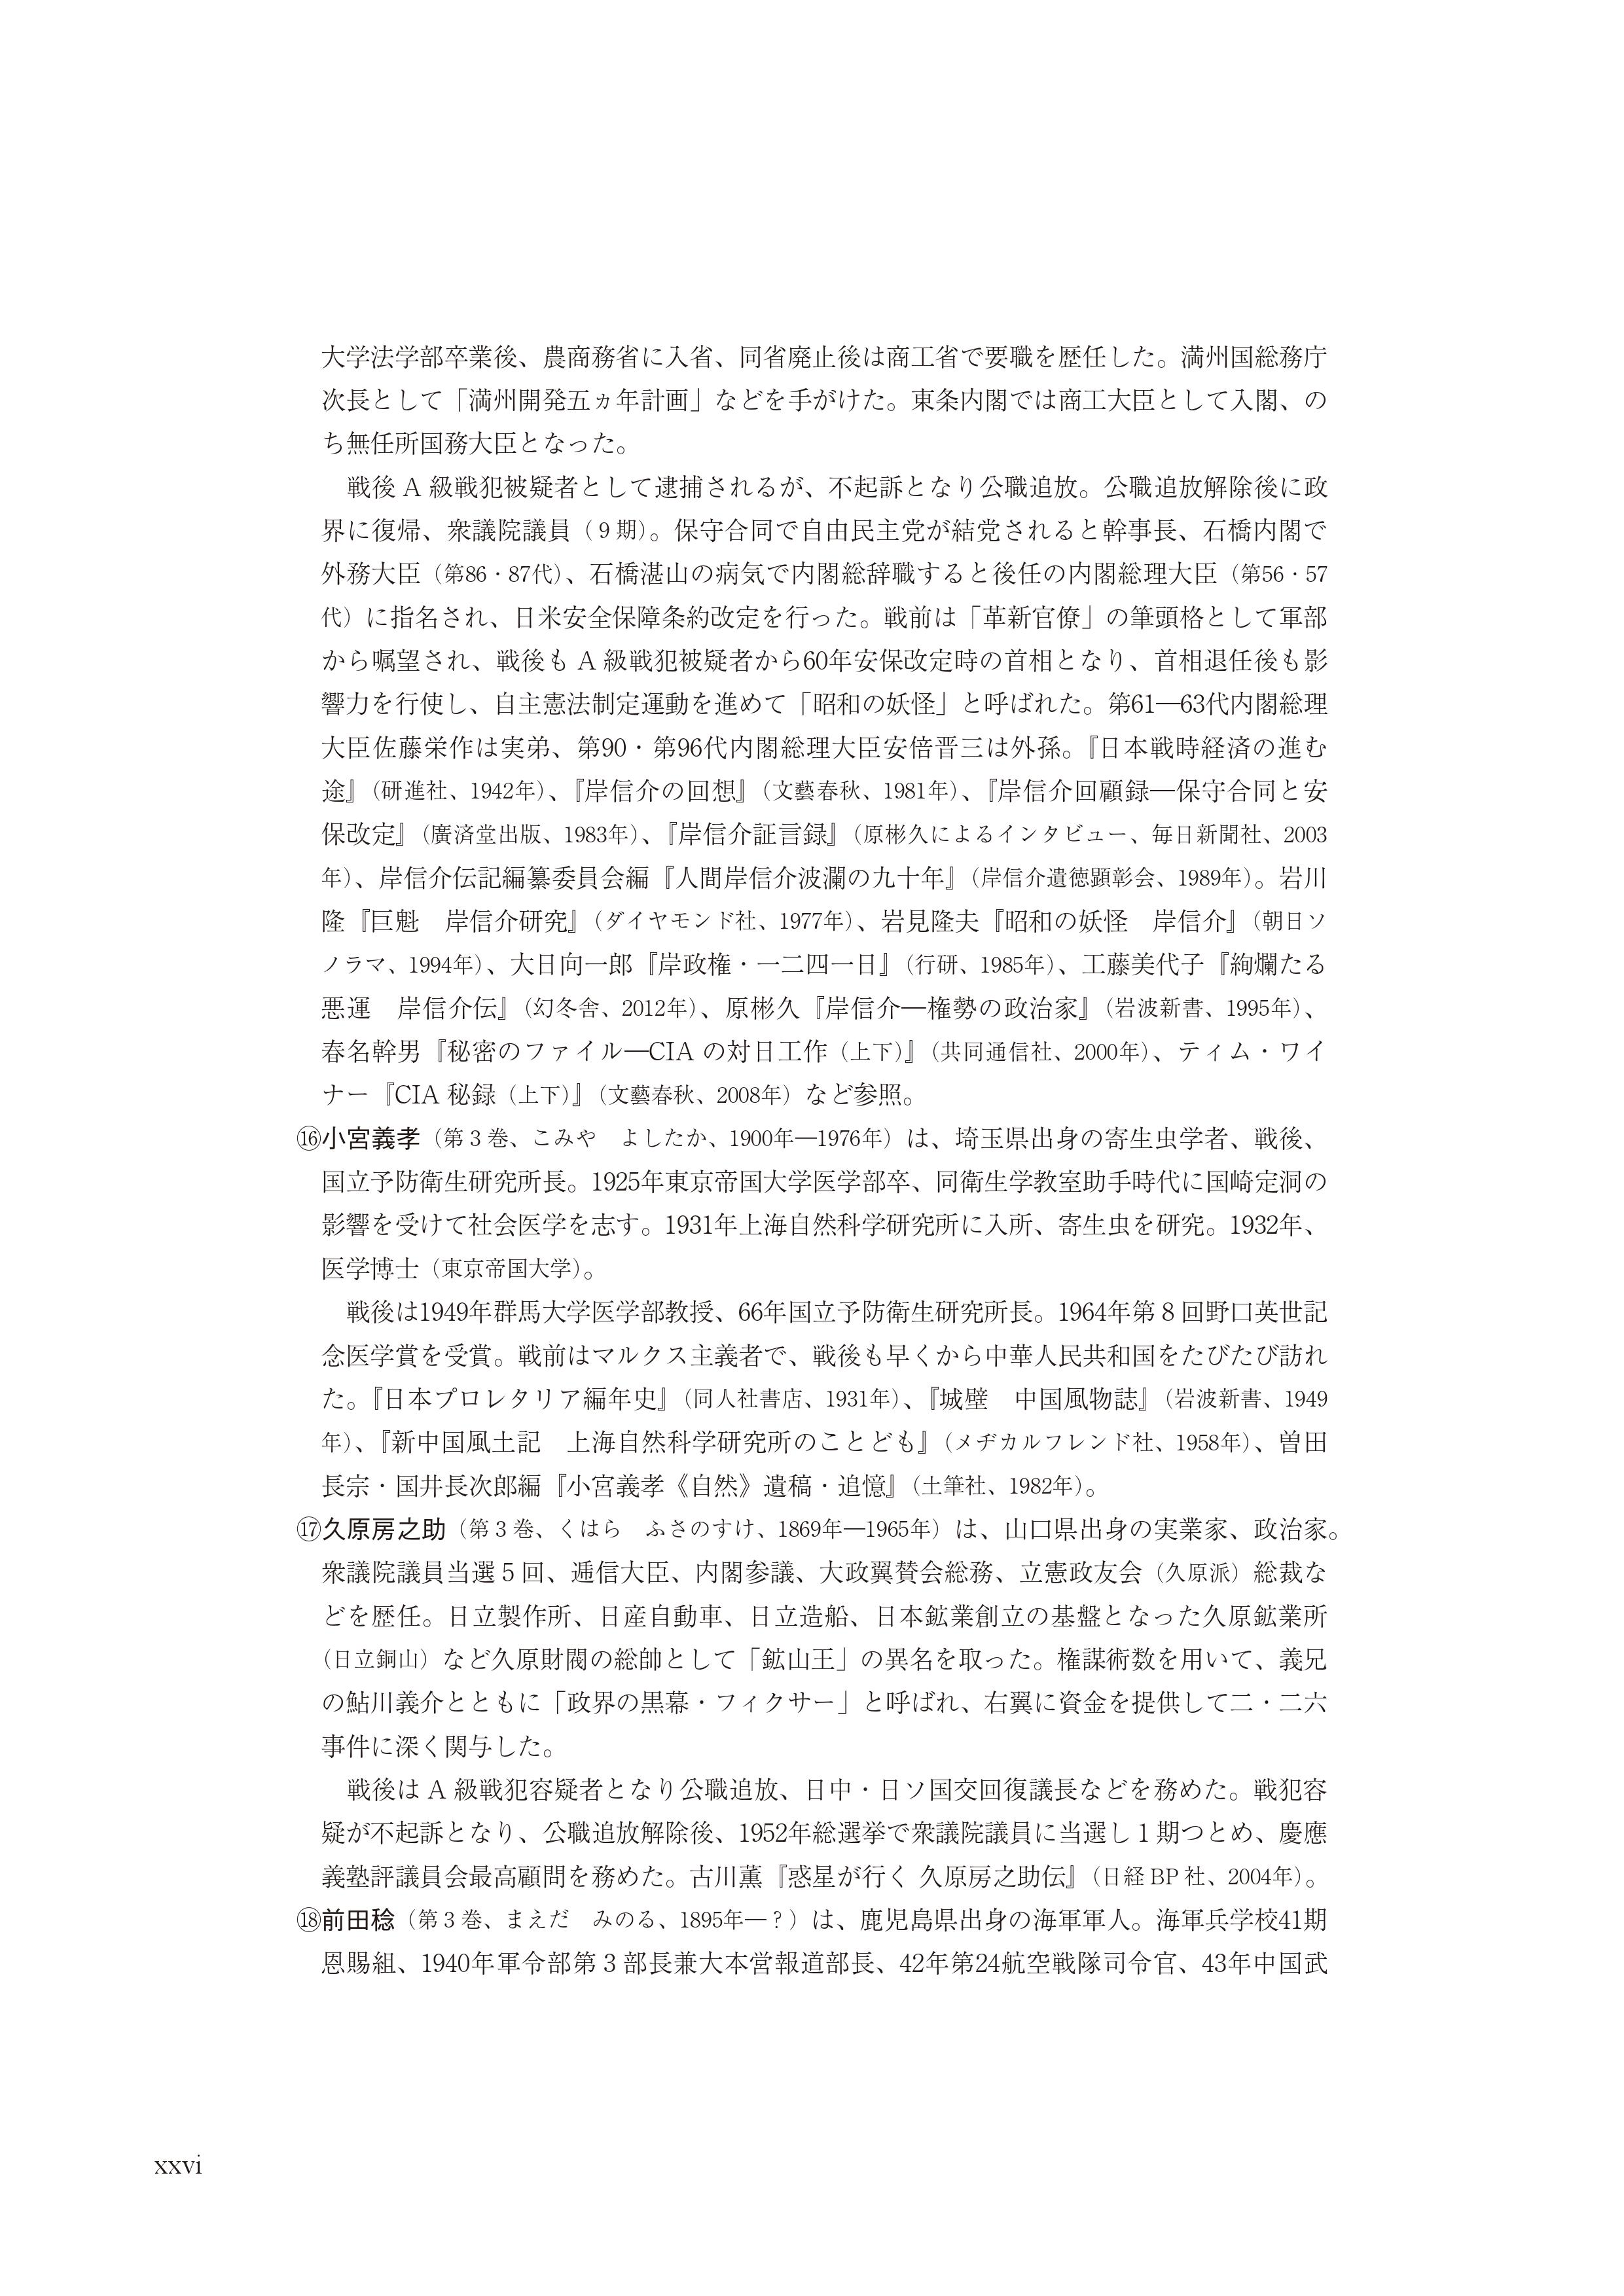 CIA日本人ファイル0001 (26)